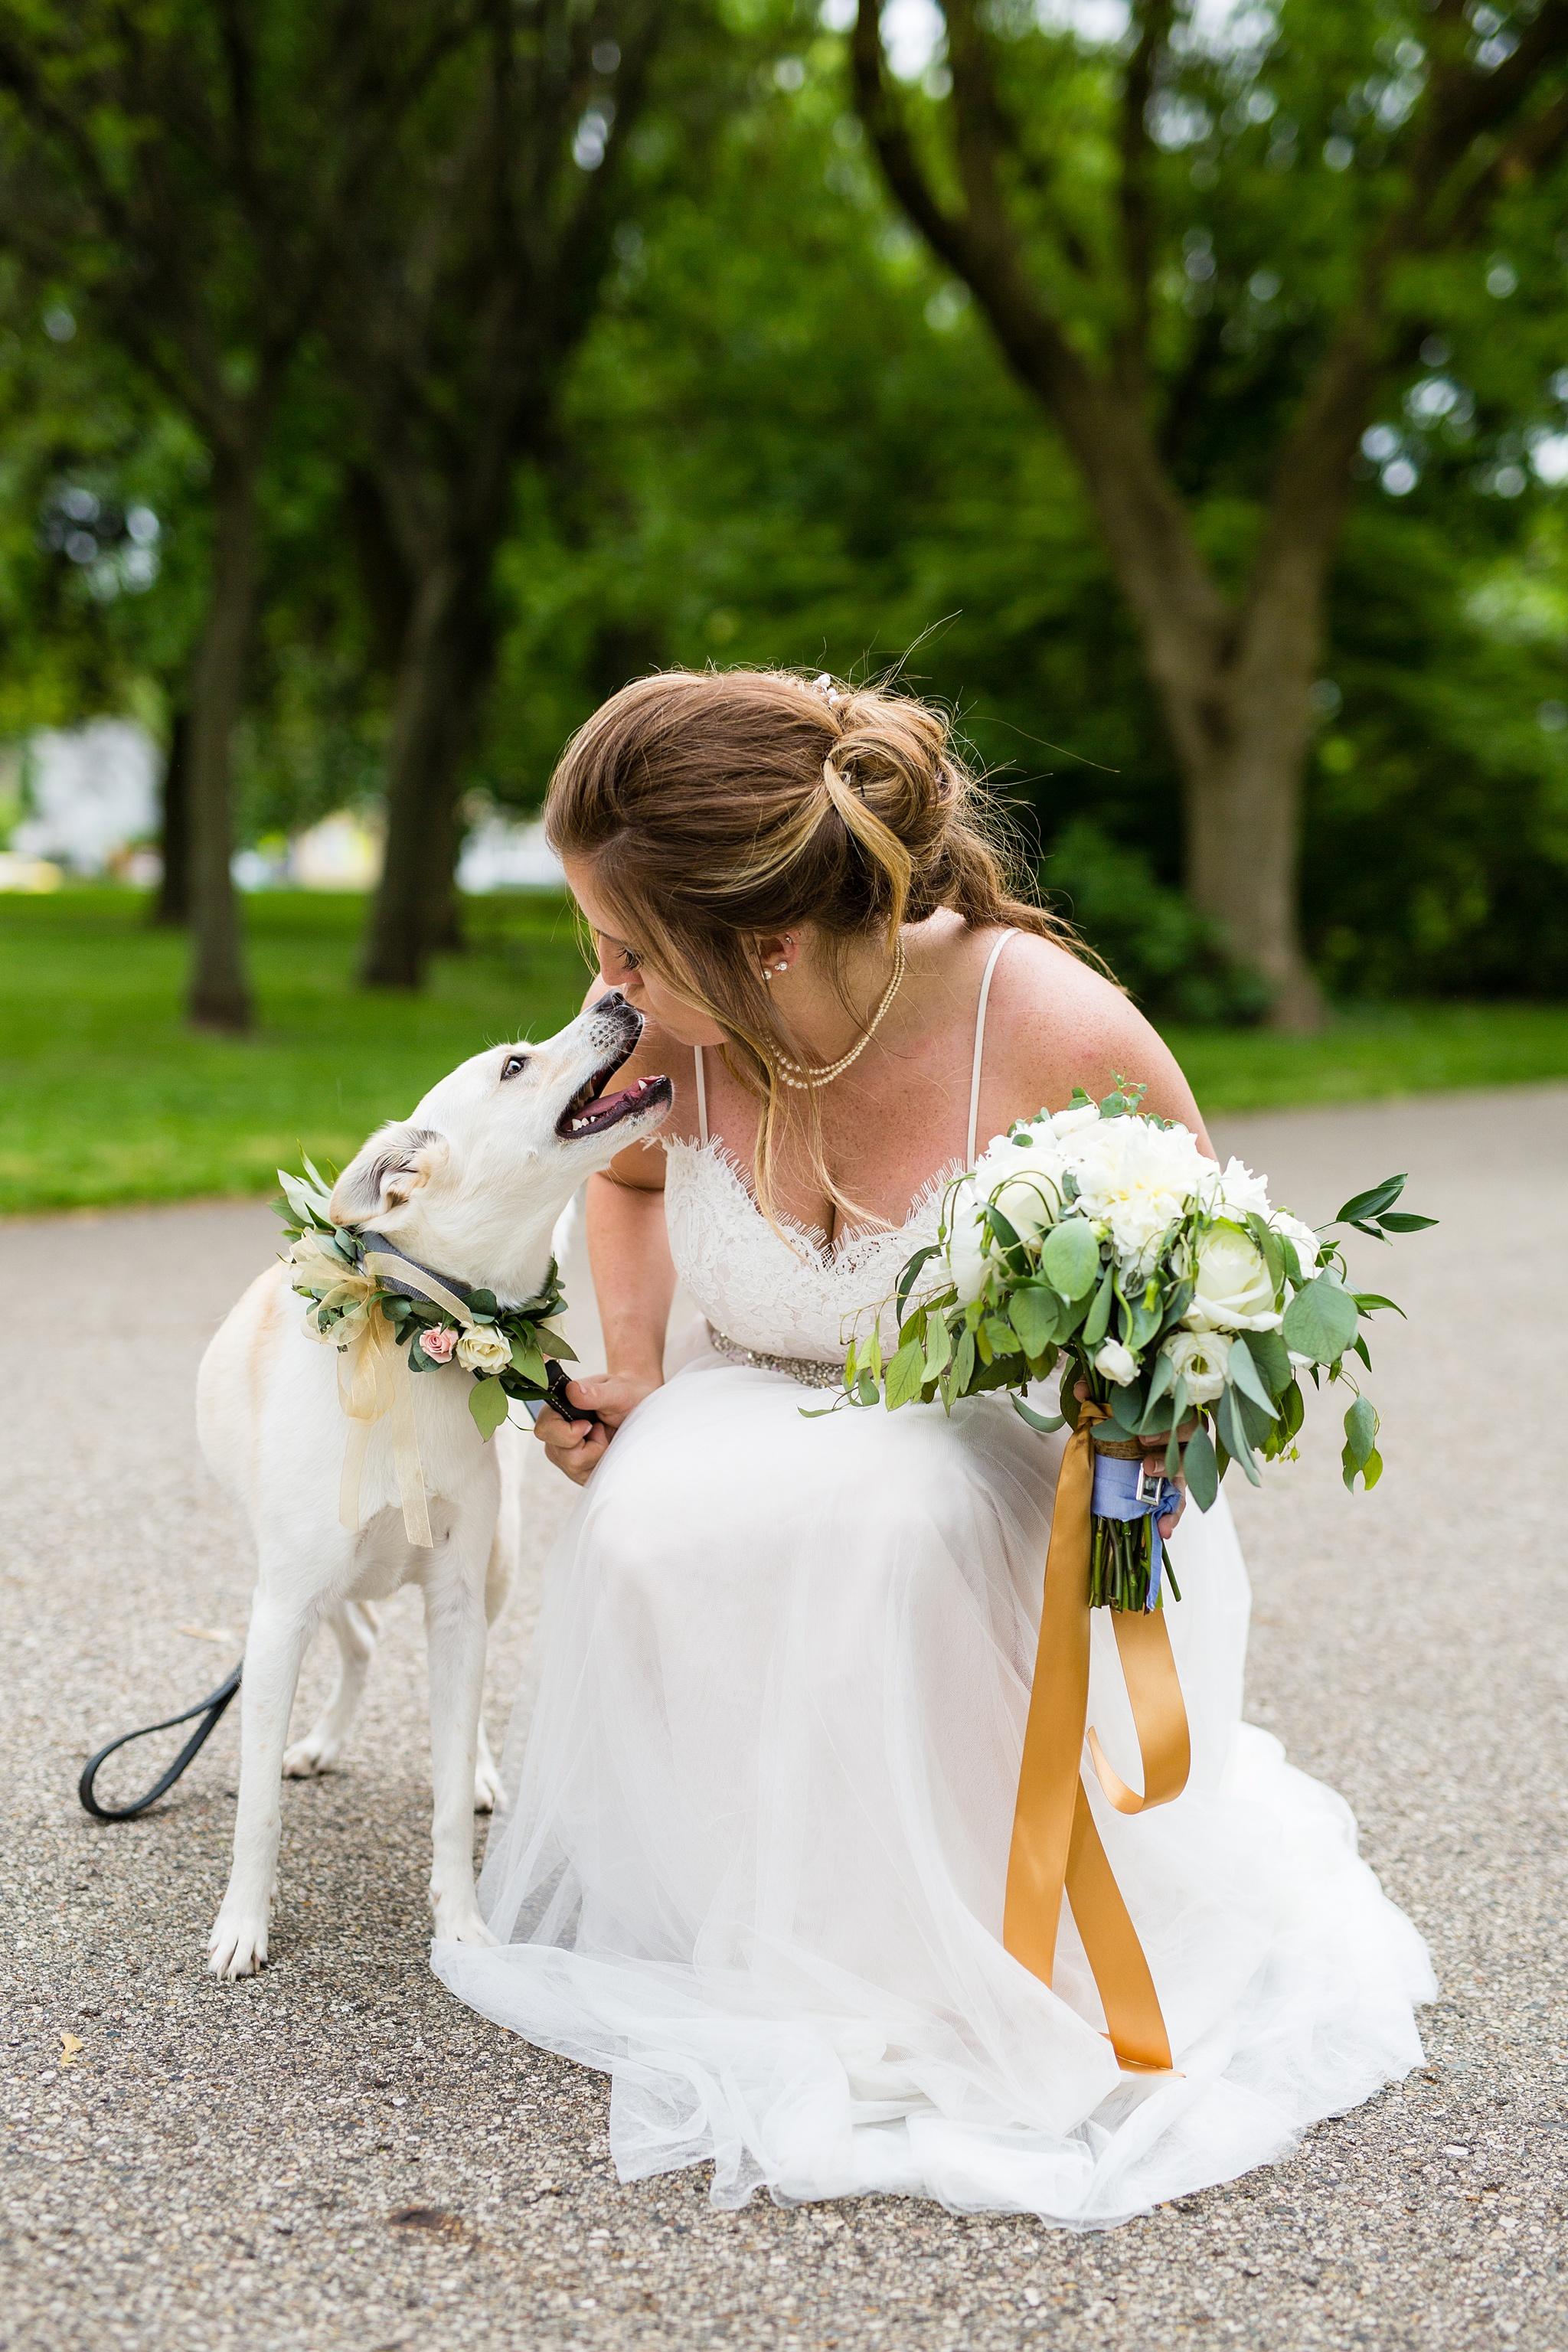 Meghan_Drew_Grand_Rapids_Cheney_place_Wedding066.JPG